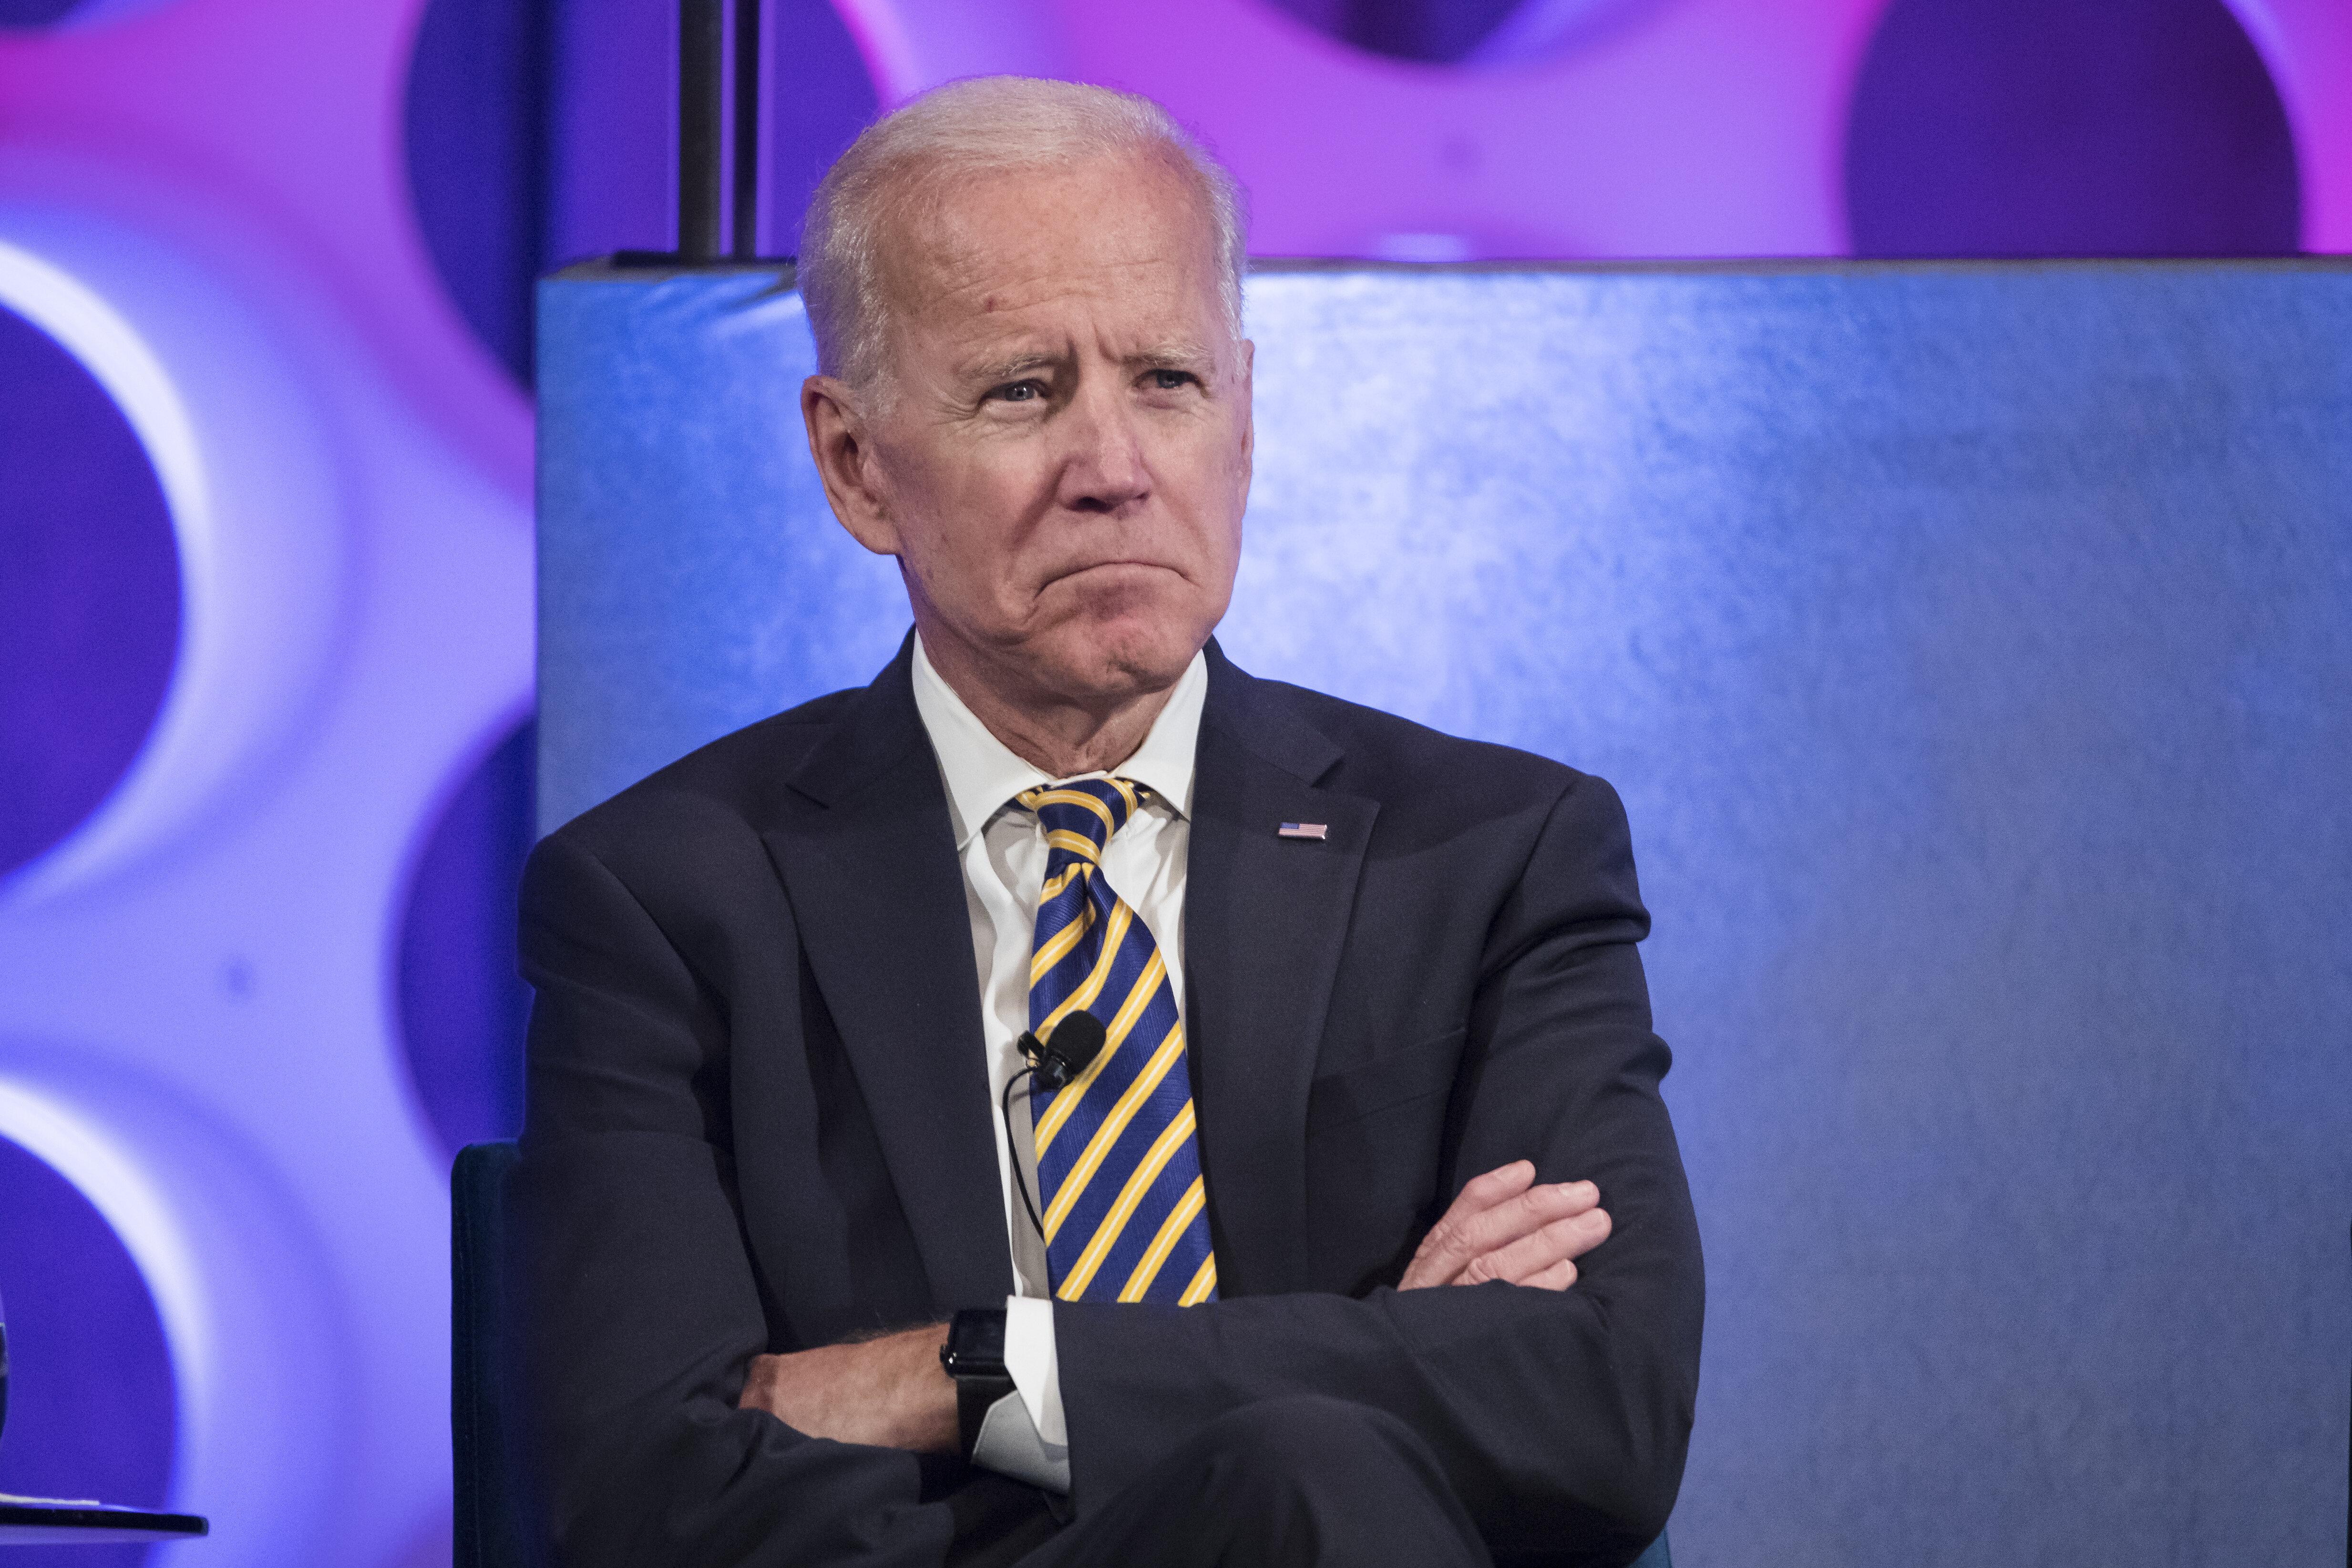 Former Vice President Joe Biden takes part in a forum on the opioid epidemic, at the University of Pennsylvania in Philadelphia, Thursday, April 11, 2019. (AP Photo/Matt Rourke)